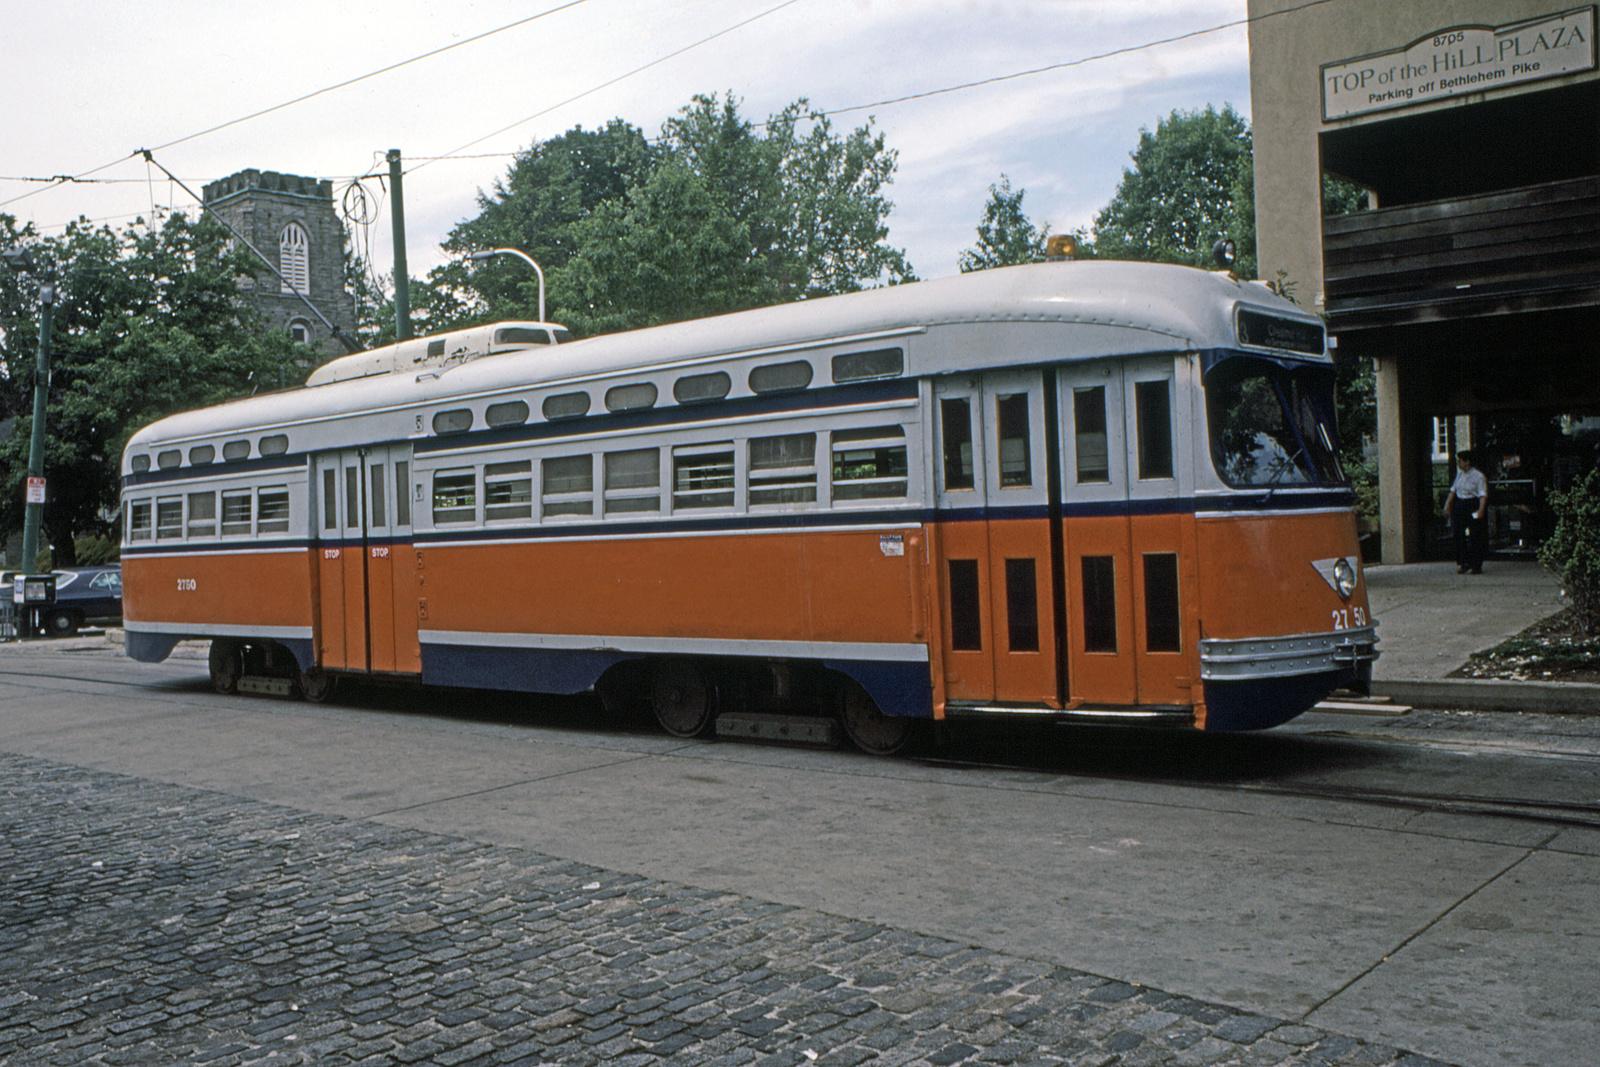 (885k, 1600x1067)<br><b>Country:</b> United States<br><b>City:</b> Philadelphia, PA<br><b>System:</b> SEPTA (or Predecessor)<br><b>Line:</b> Rt. 23-Germantown<br><b>Location:</b> Bethlehem Pike/Chestnut Hill Loop<br><b>Car:</b> PTC/SEPTA Postwar All-electric PCC (St.Louis, 1947) 2750 <br><b>Collection of:</b> David Pirmann<br><b>Date:</b> 9/1985<br><b>Viewed (this week/total):</b> 3 / 82